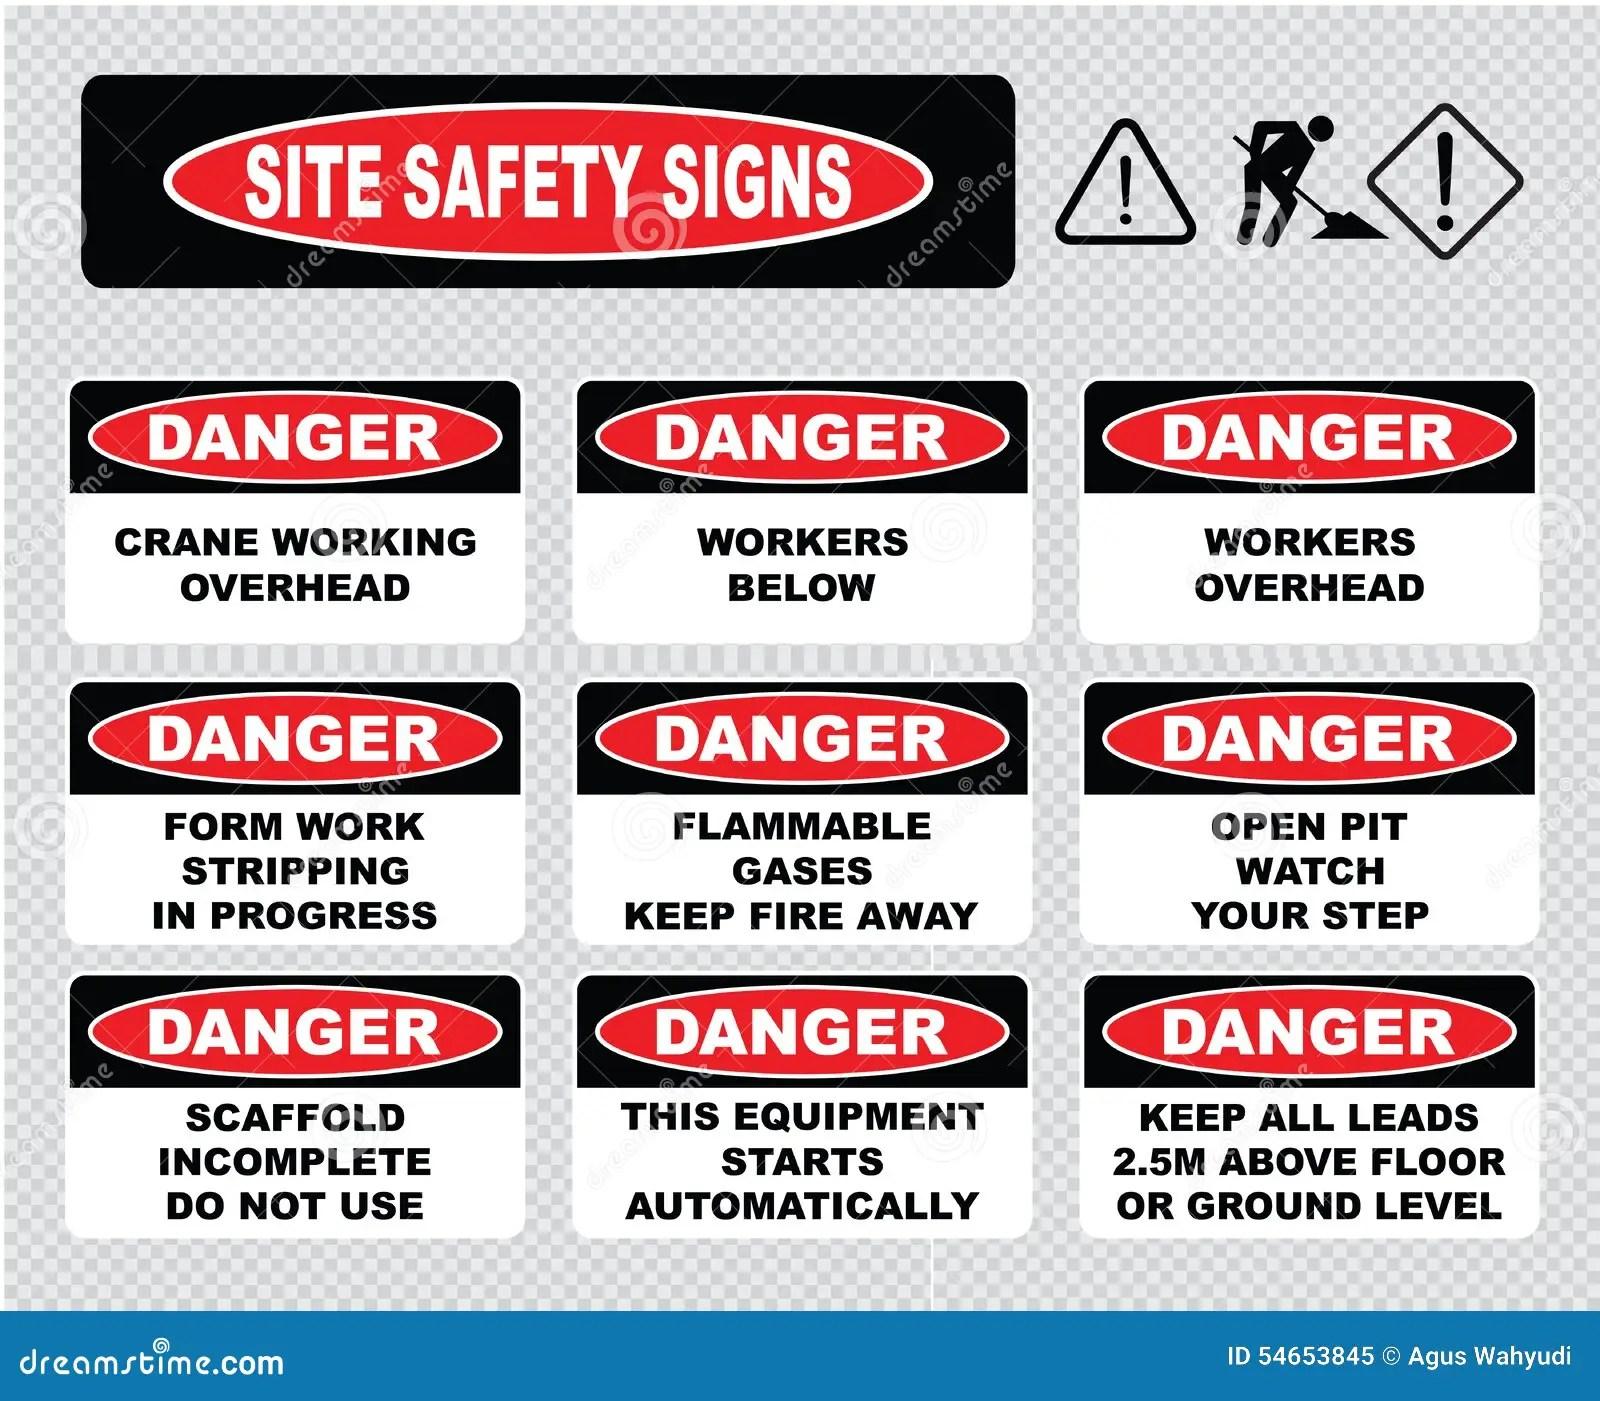 Site Safety Signs Stock Illustration Illustration Of